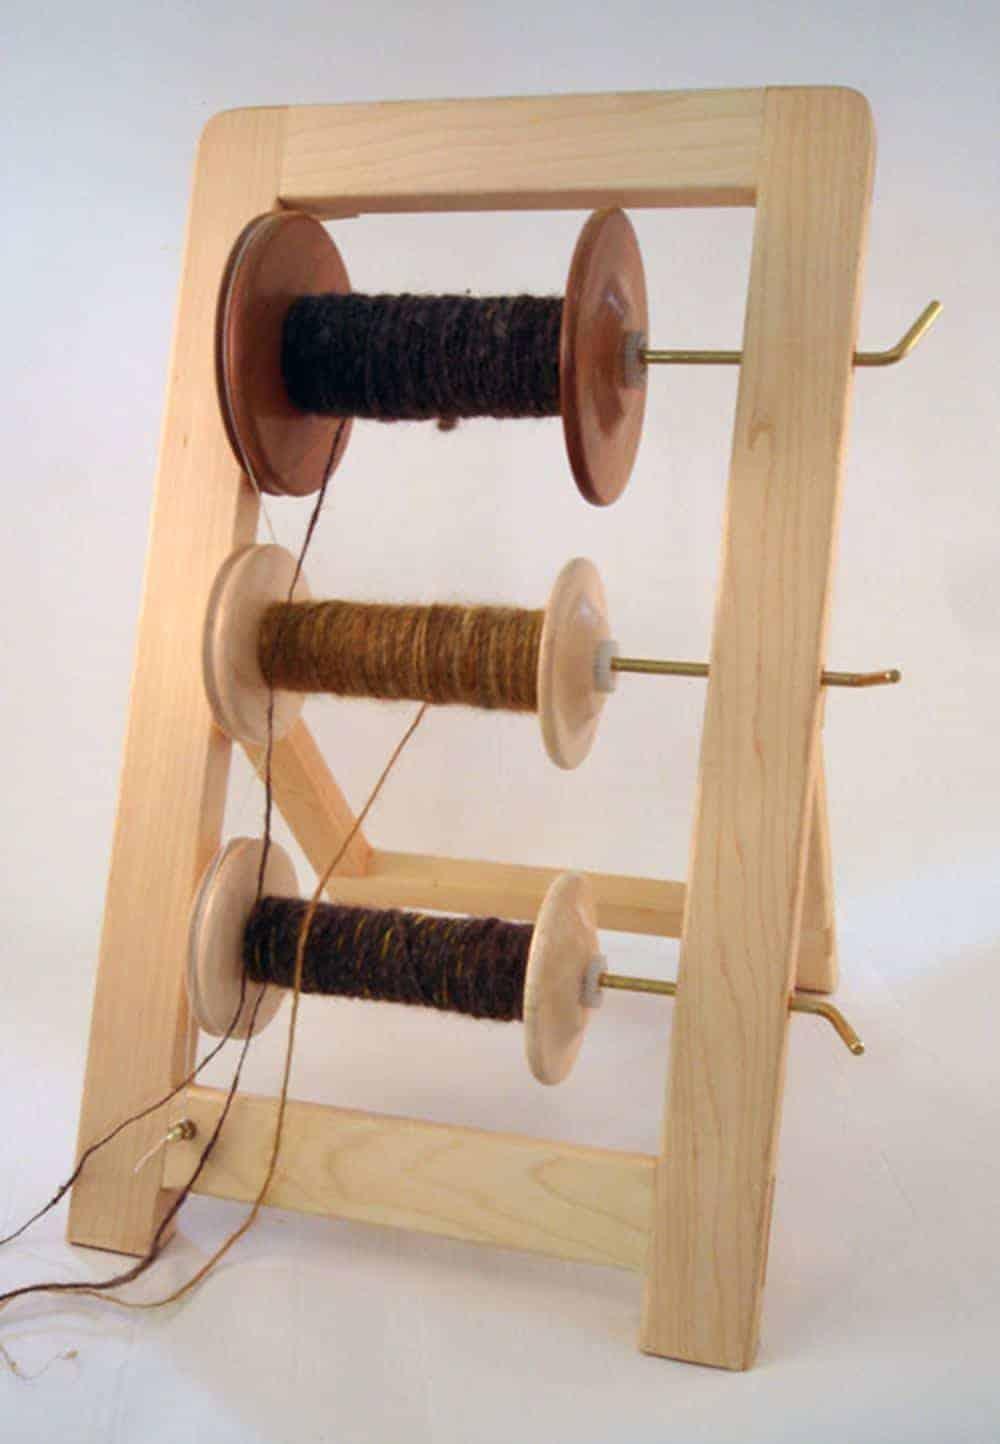 Lazy Kate wood spinning bobbins